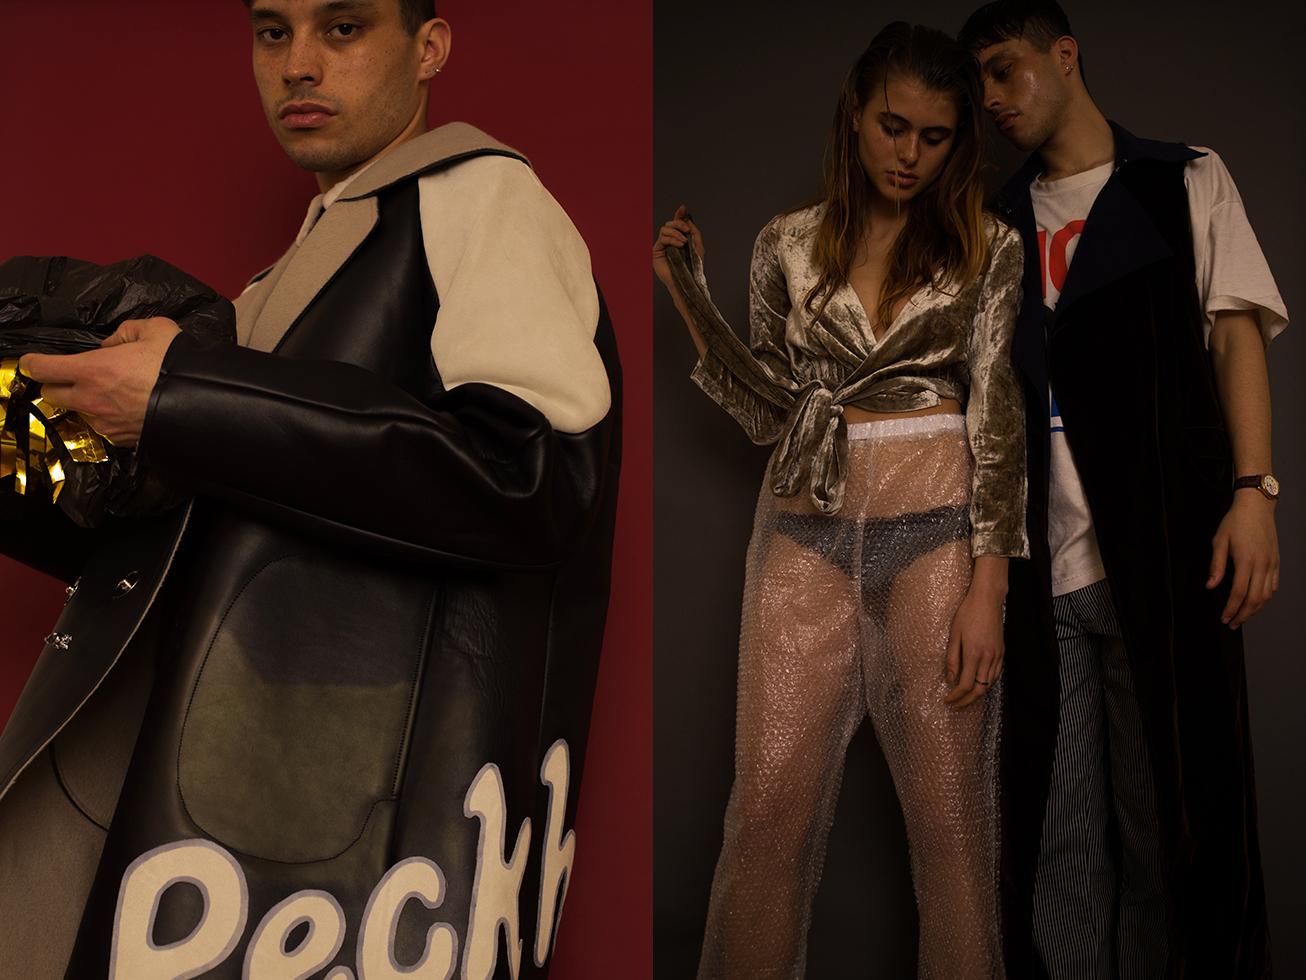 Oisín wears leather coat and pants   DANIEL W. FLETCHER  . Shanti wears top   SOPHIE CULL CANDY   bubble wrap pants   A-L-C-H   underwear  STYLIST'S OWN  and Oisìn wears t-shirt  STYLIST'S OWN sleeveless coat   CHIN MENS  pants   GRIND LONDON